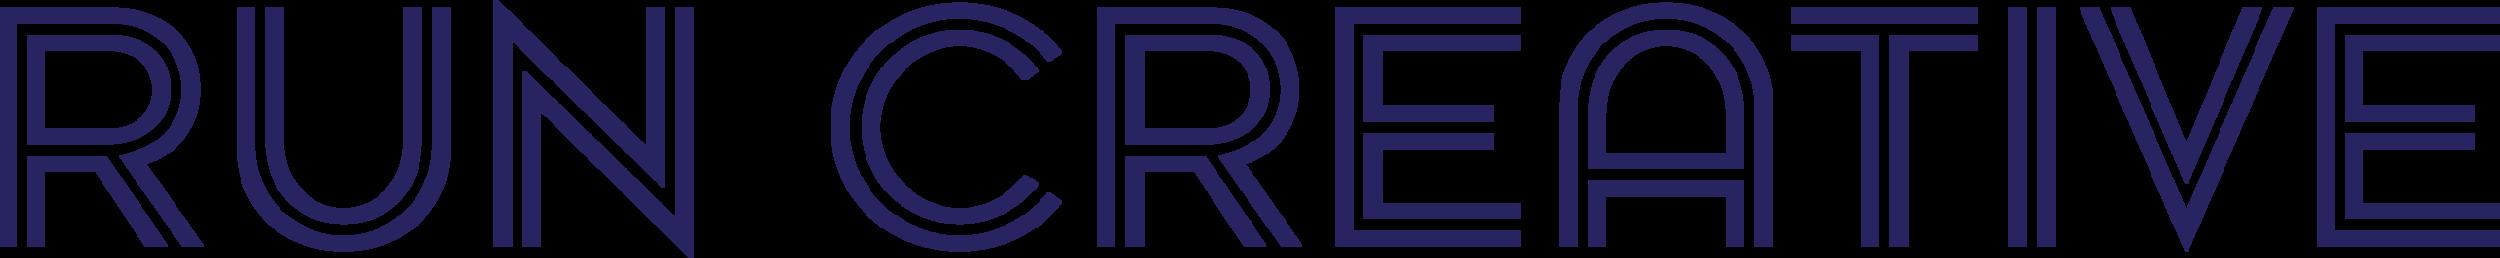 RUN_CREATIVE_TYPE_DARK BLUE_300dpi_RGB.png